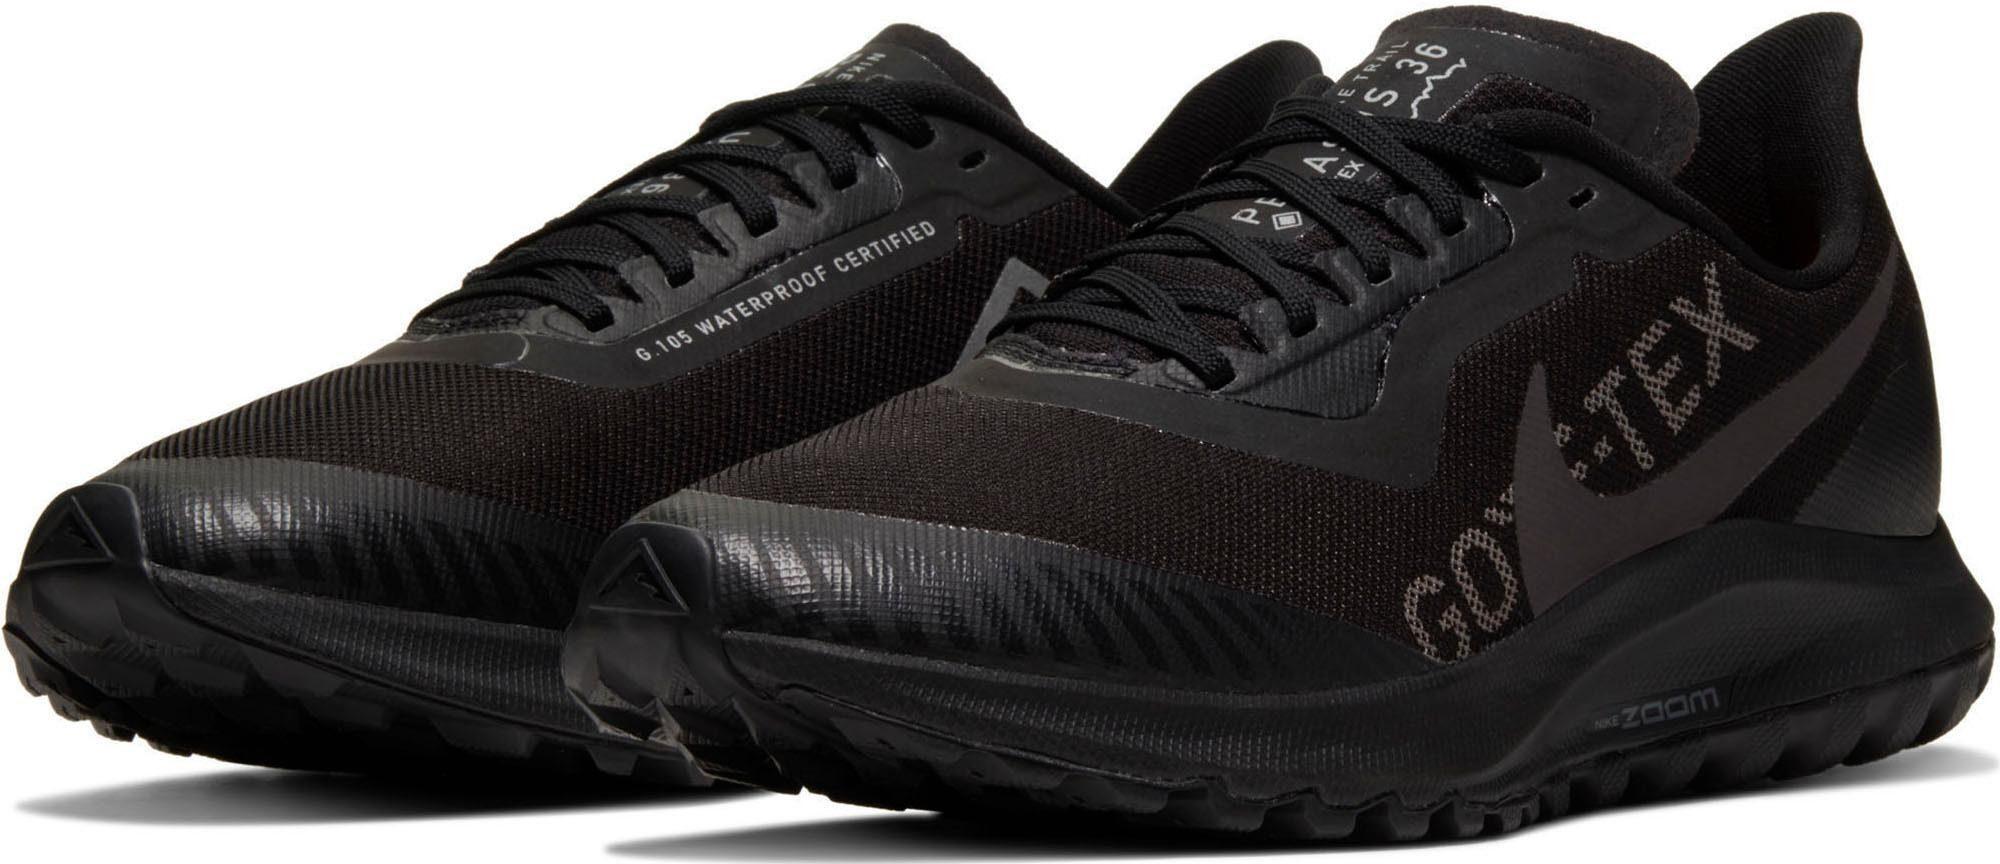 Nike Zoom 36 Laufschuh kaufenOTTO Pegasus »Wmns Goretex« Trail online Tl1KcJF3